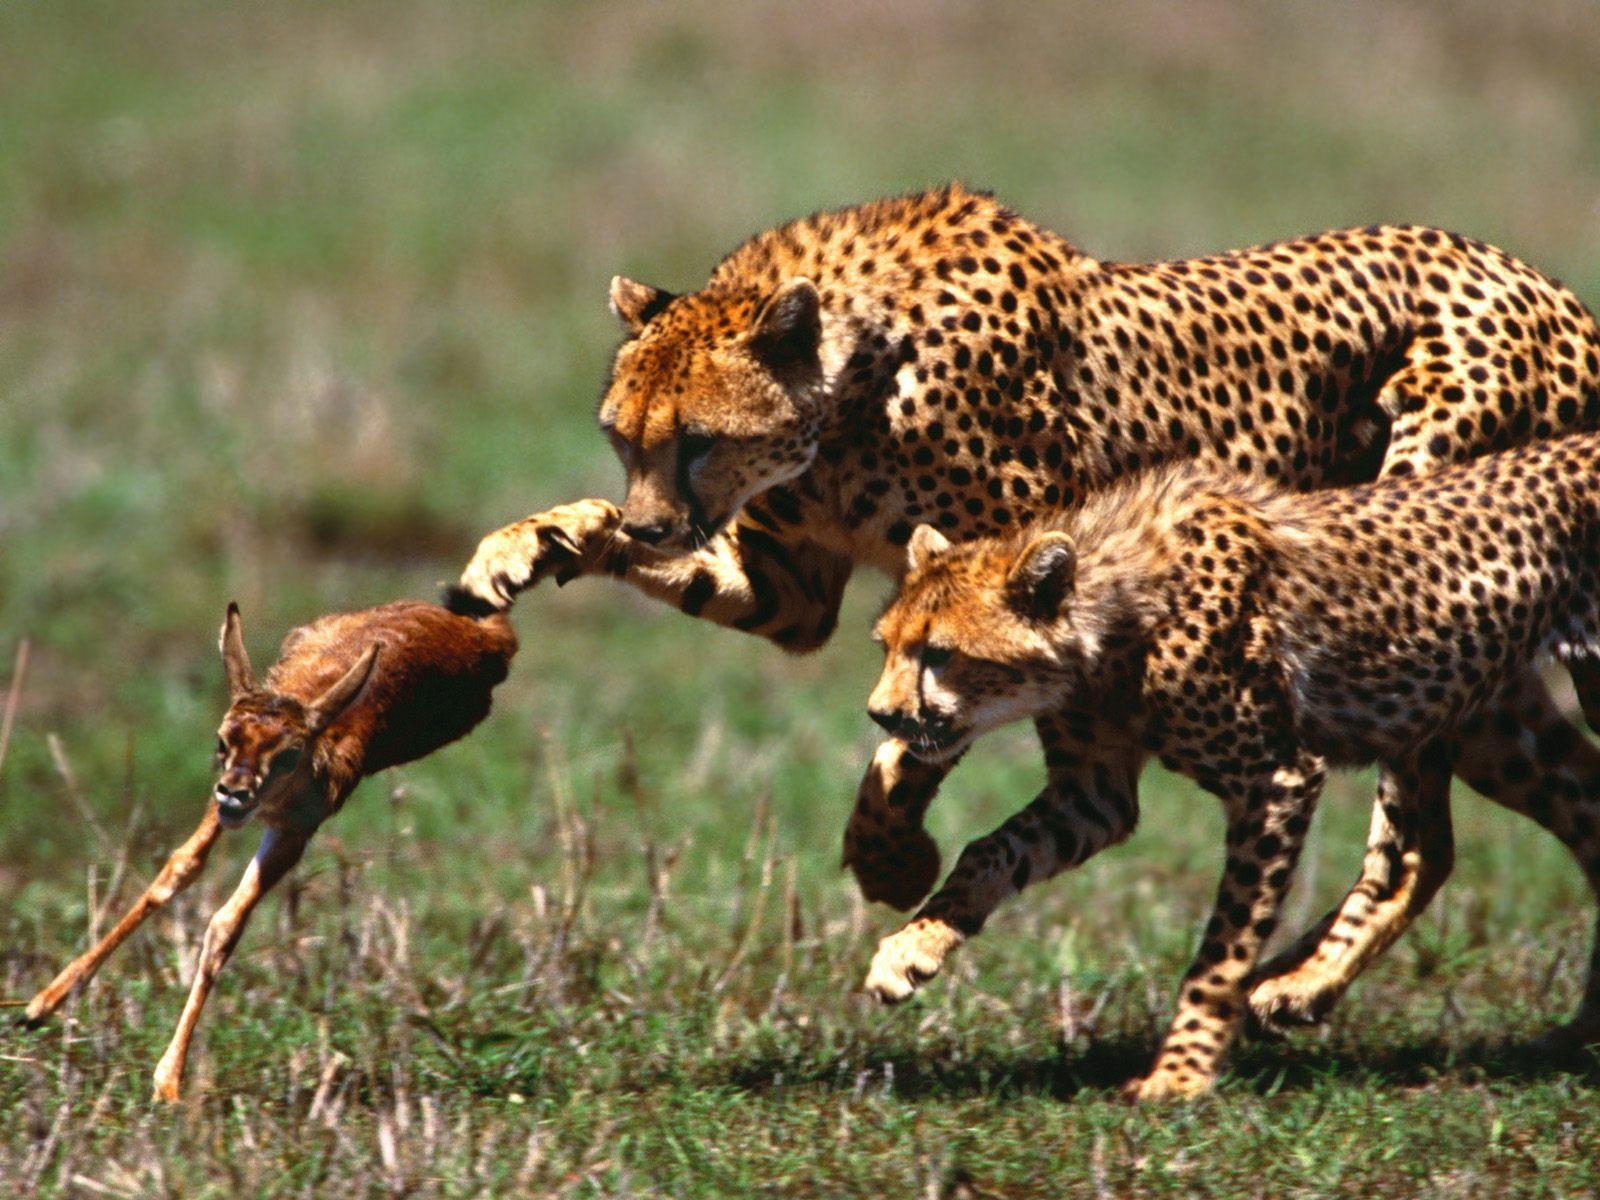 Wallpapersafari: African Animals Wallpaper